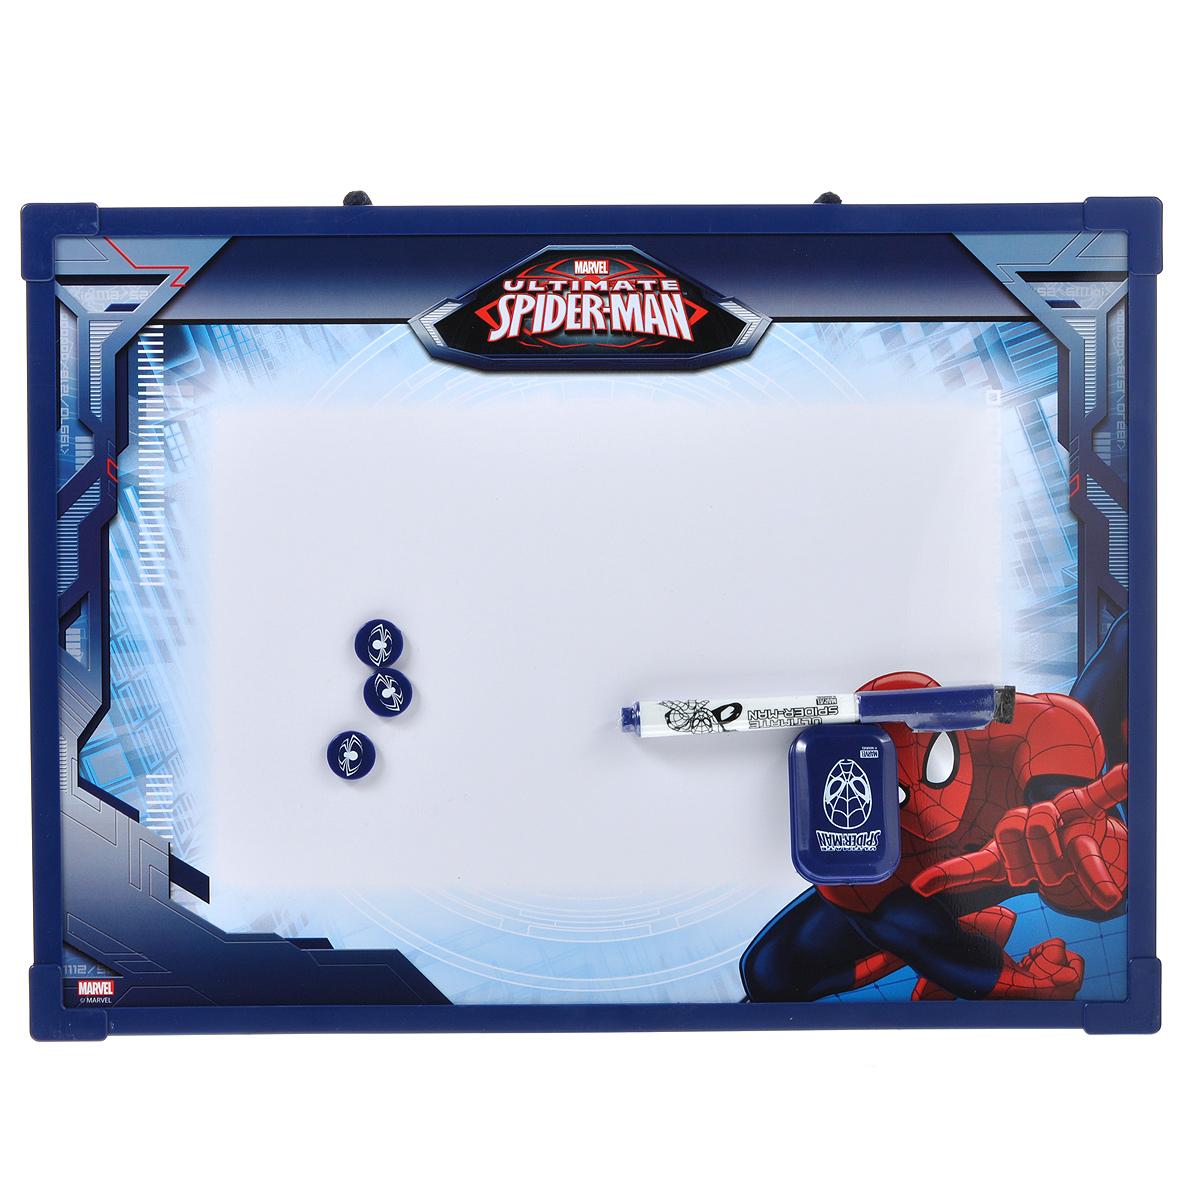 "Доска магнитно-маркерная ""Spider-Man"", цвет: темно-синий, с аксессуарами. SMBB-US2-Z150098"